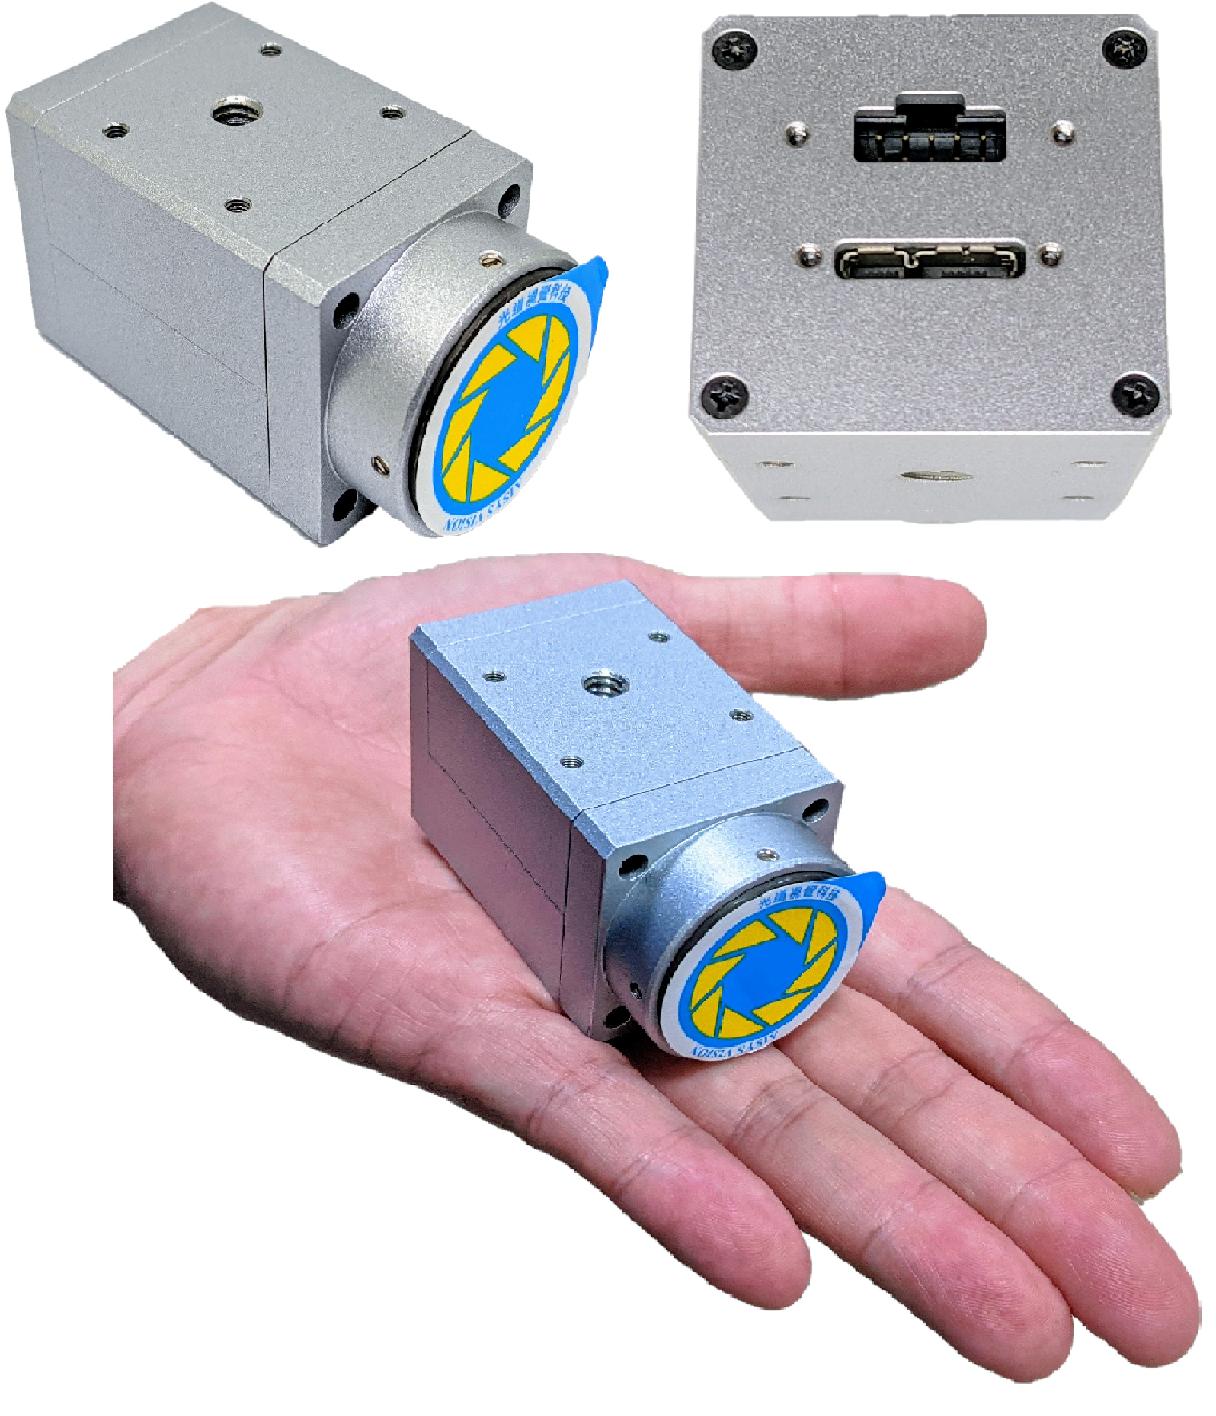 CYCLOPS SU500C-14攝影機-5.0M像素、內同步式、彩色、內建LED燈源控制器